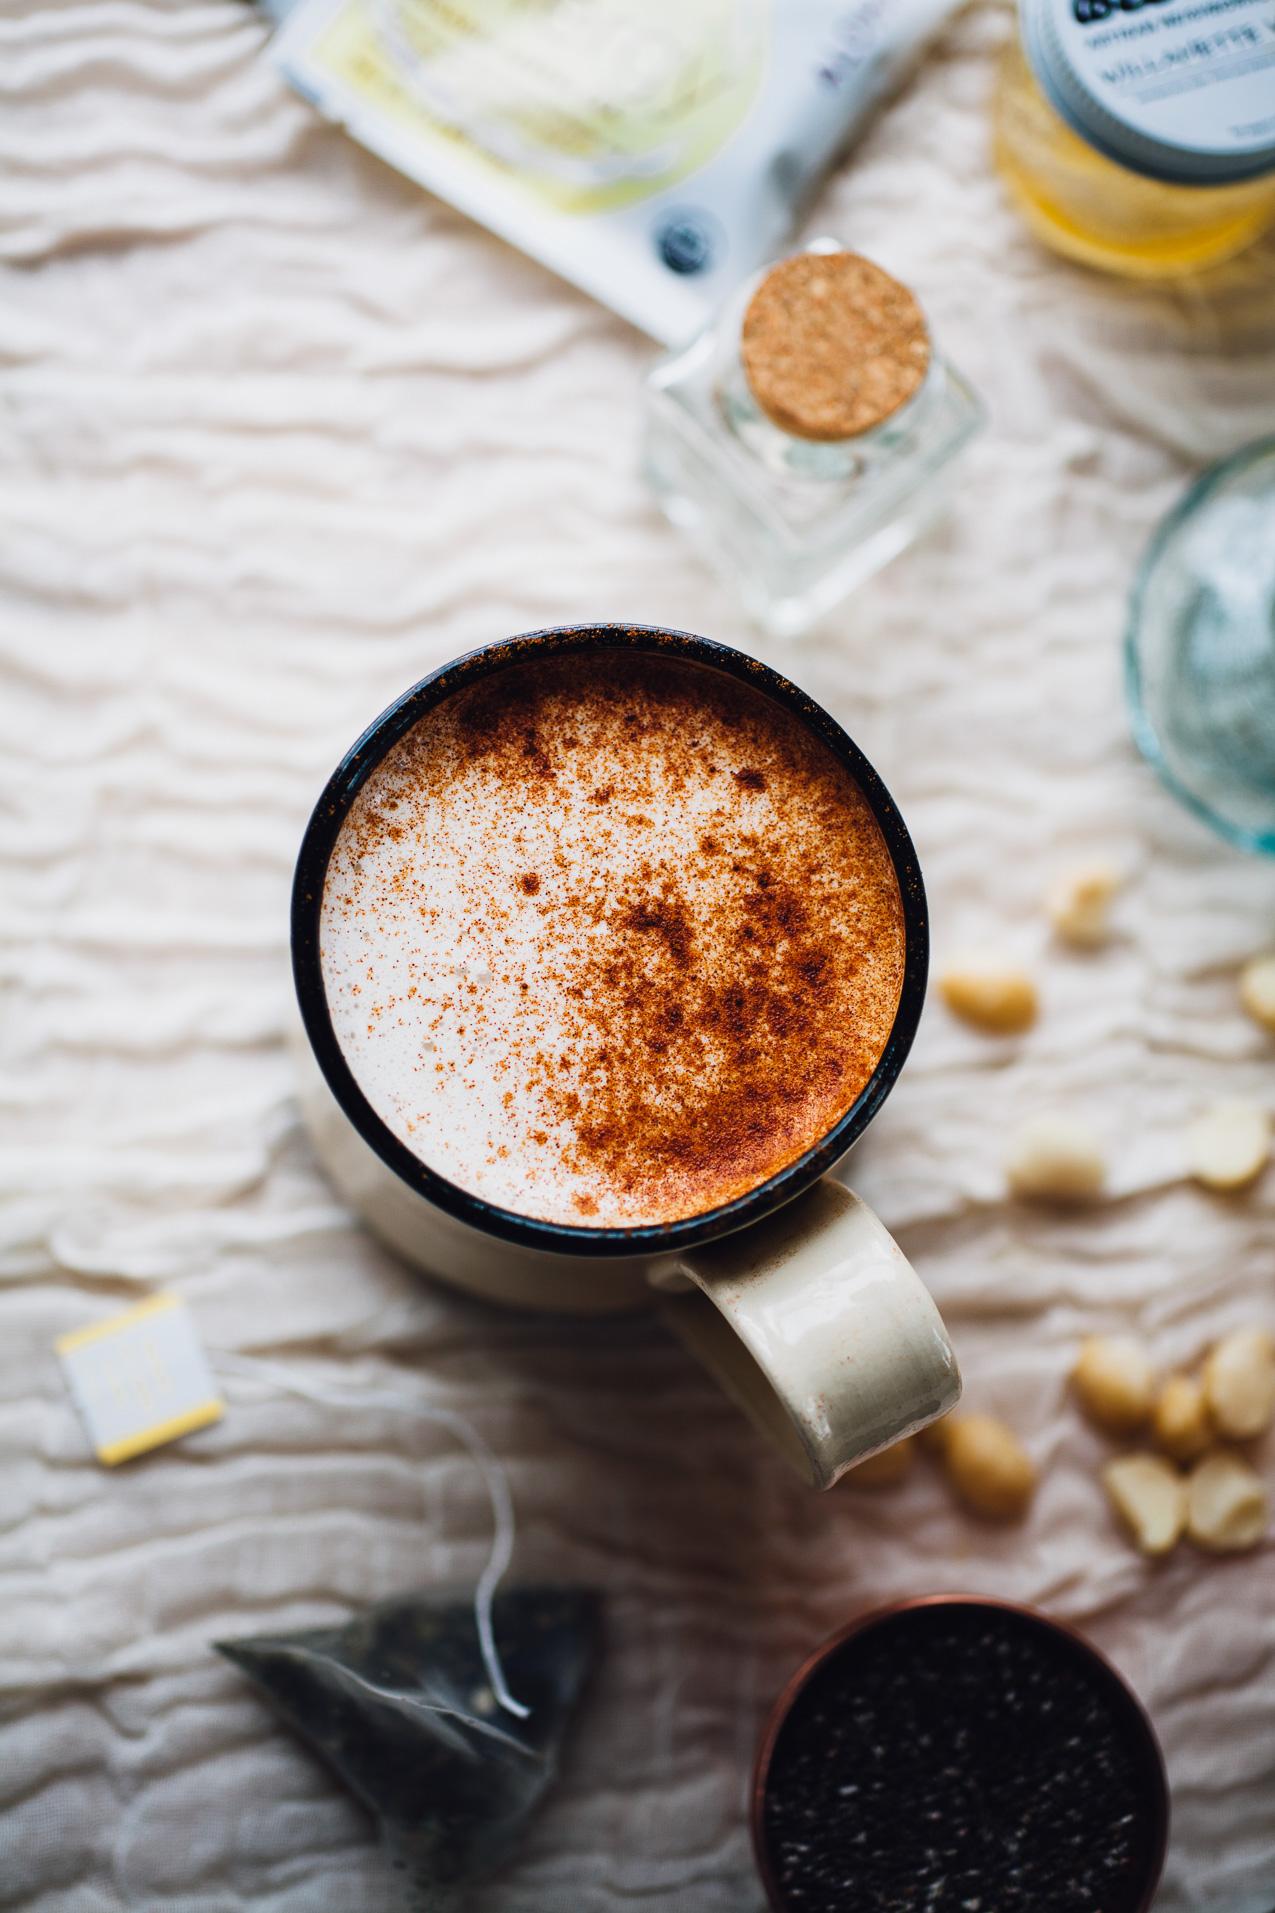 macadamia-yerba-mate-latte-vegan-4448.jpg